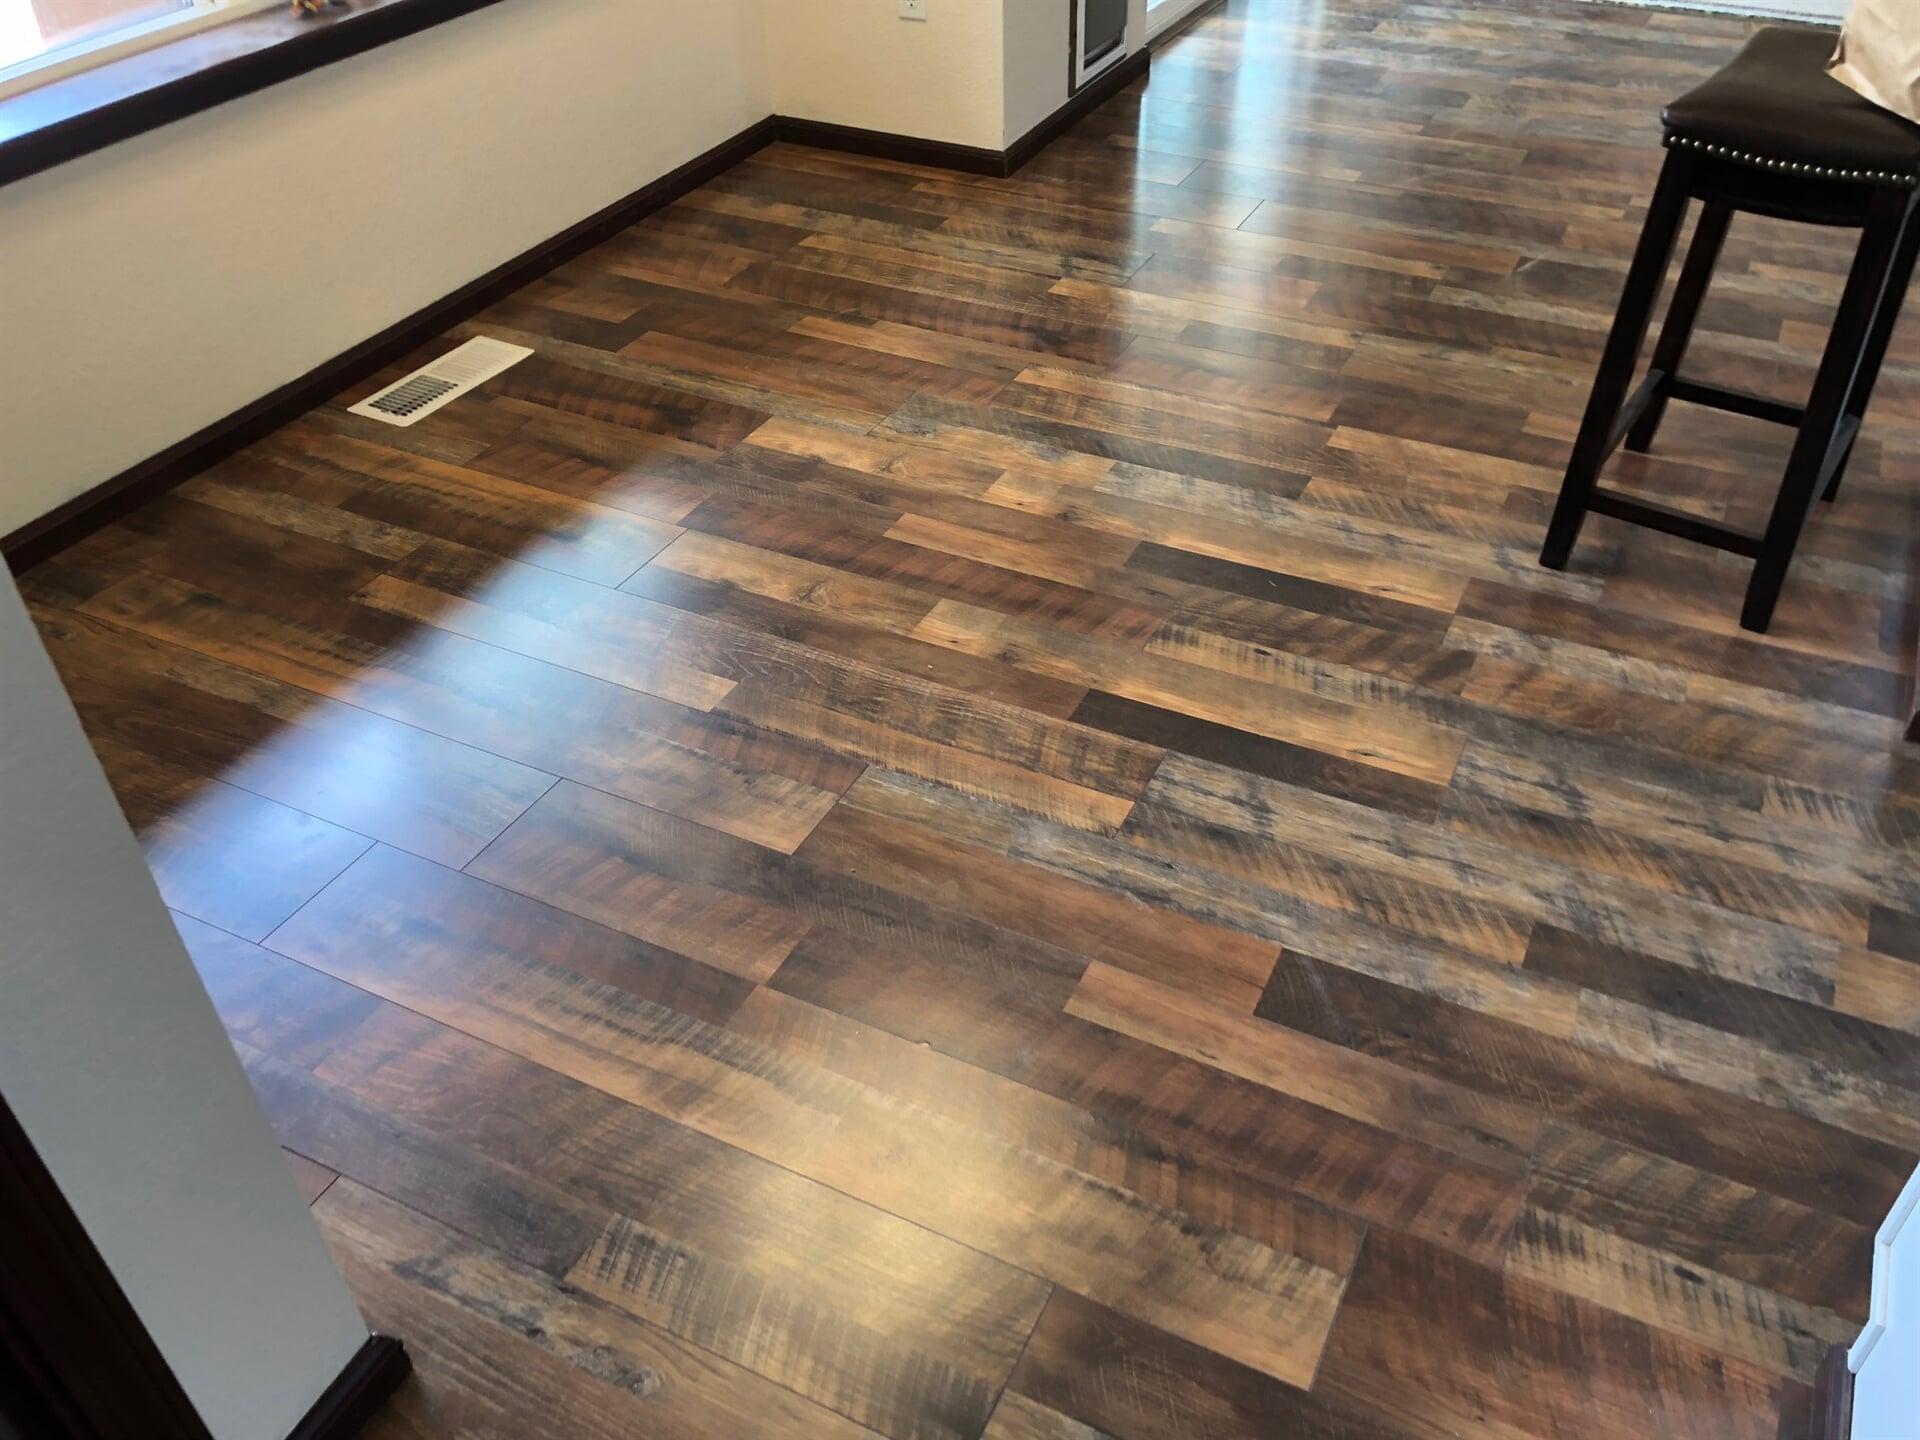 Hardwood flooring from Emerald Installation in Pierce County, WA